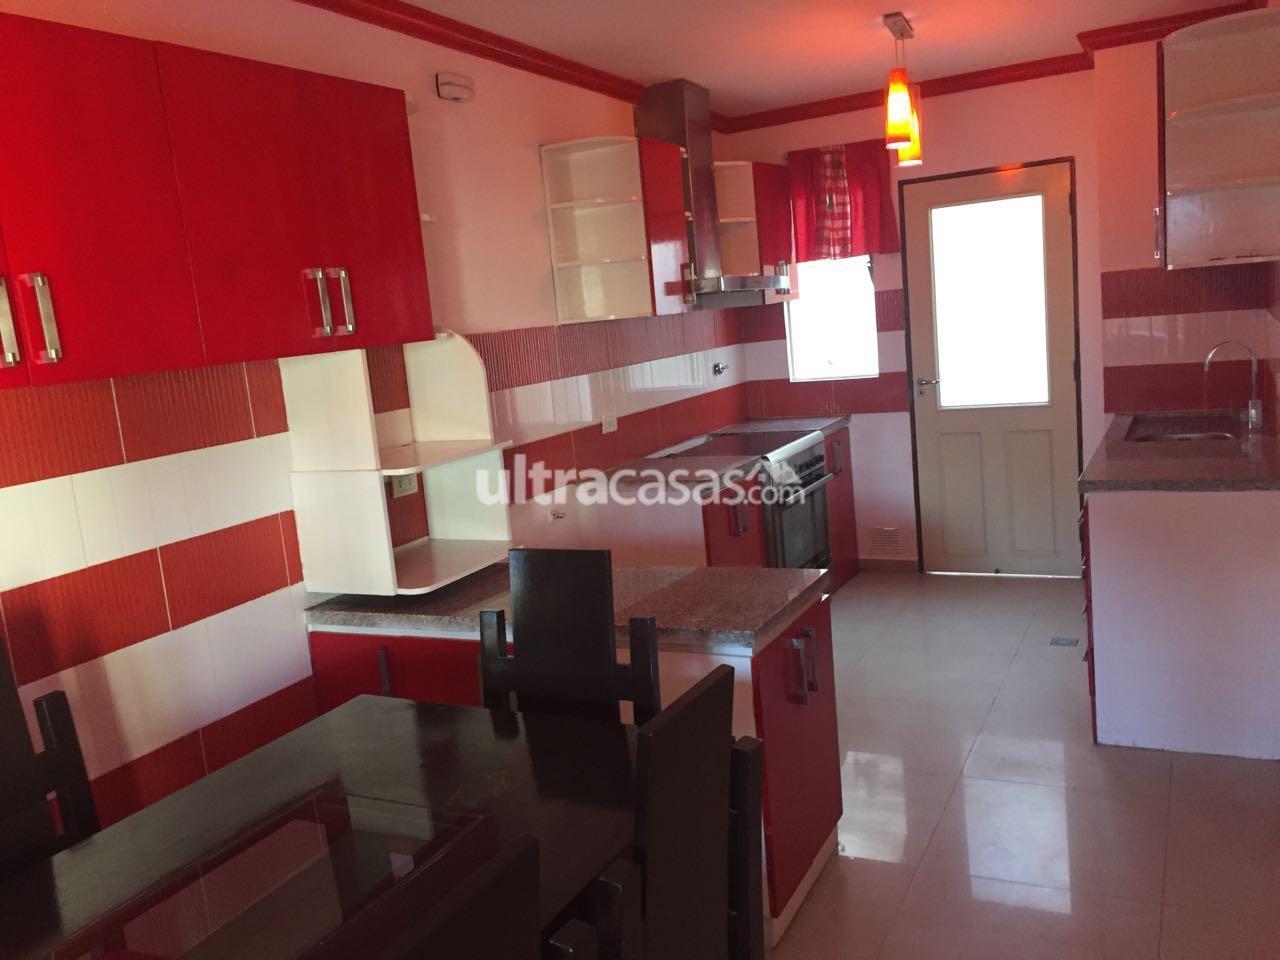 Casa en Venta Av. Banzer km, 10, condominio Sevilla Las Terazas I, calle San Pedro Oeste 24. Foto 18